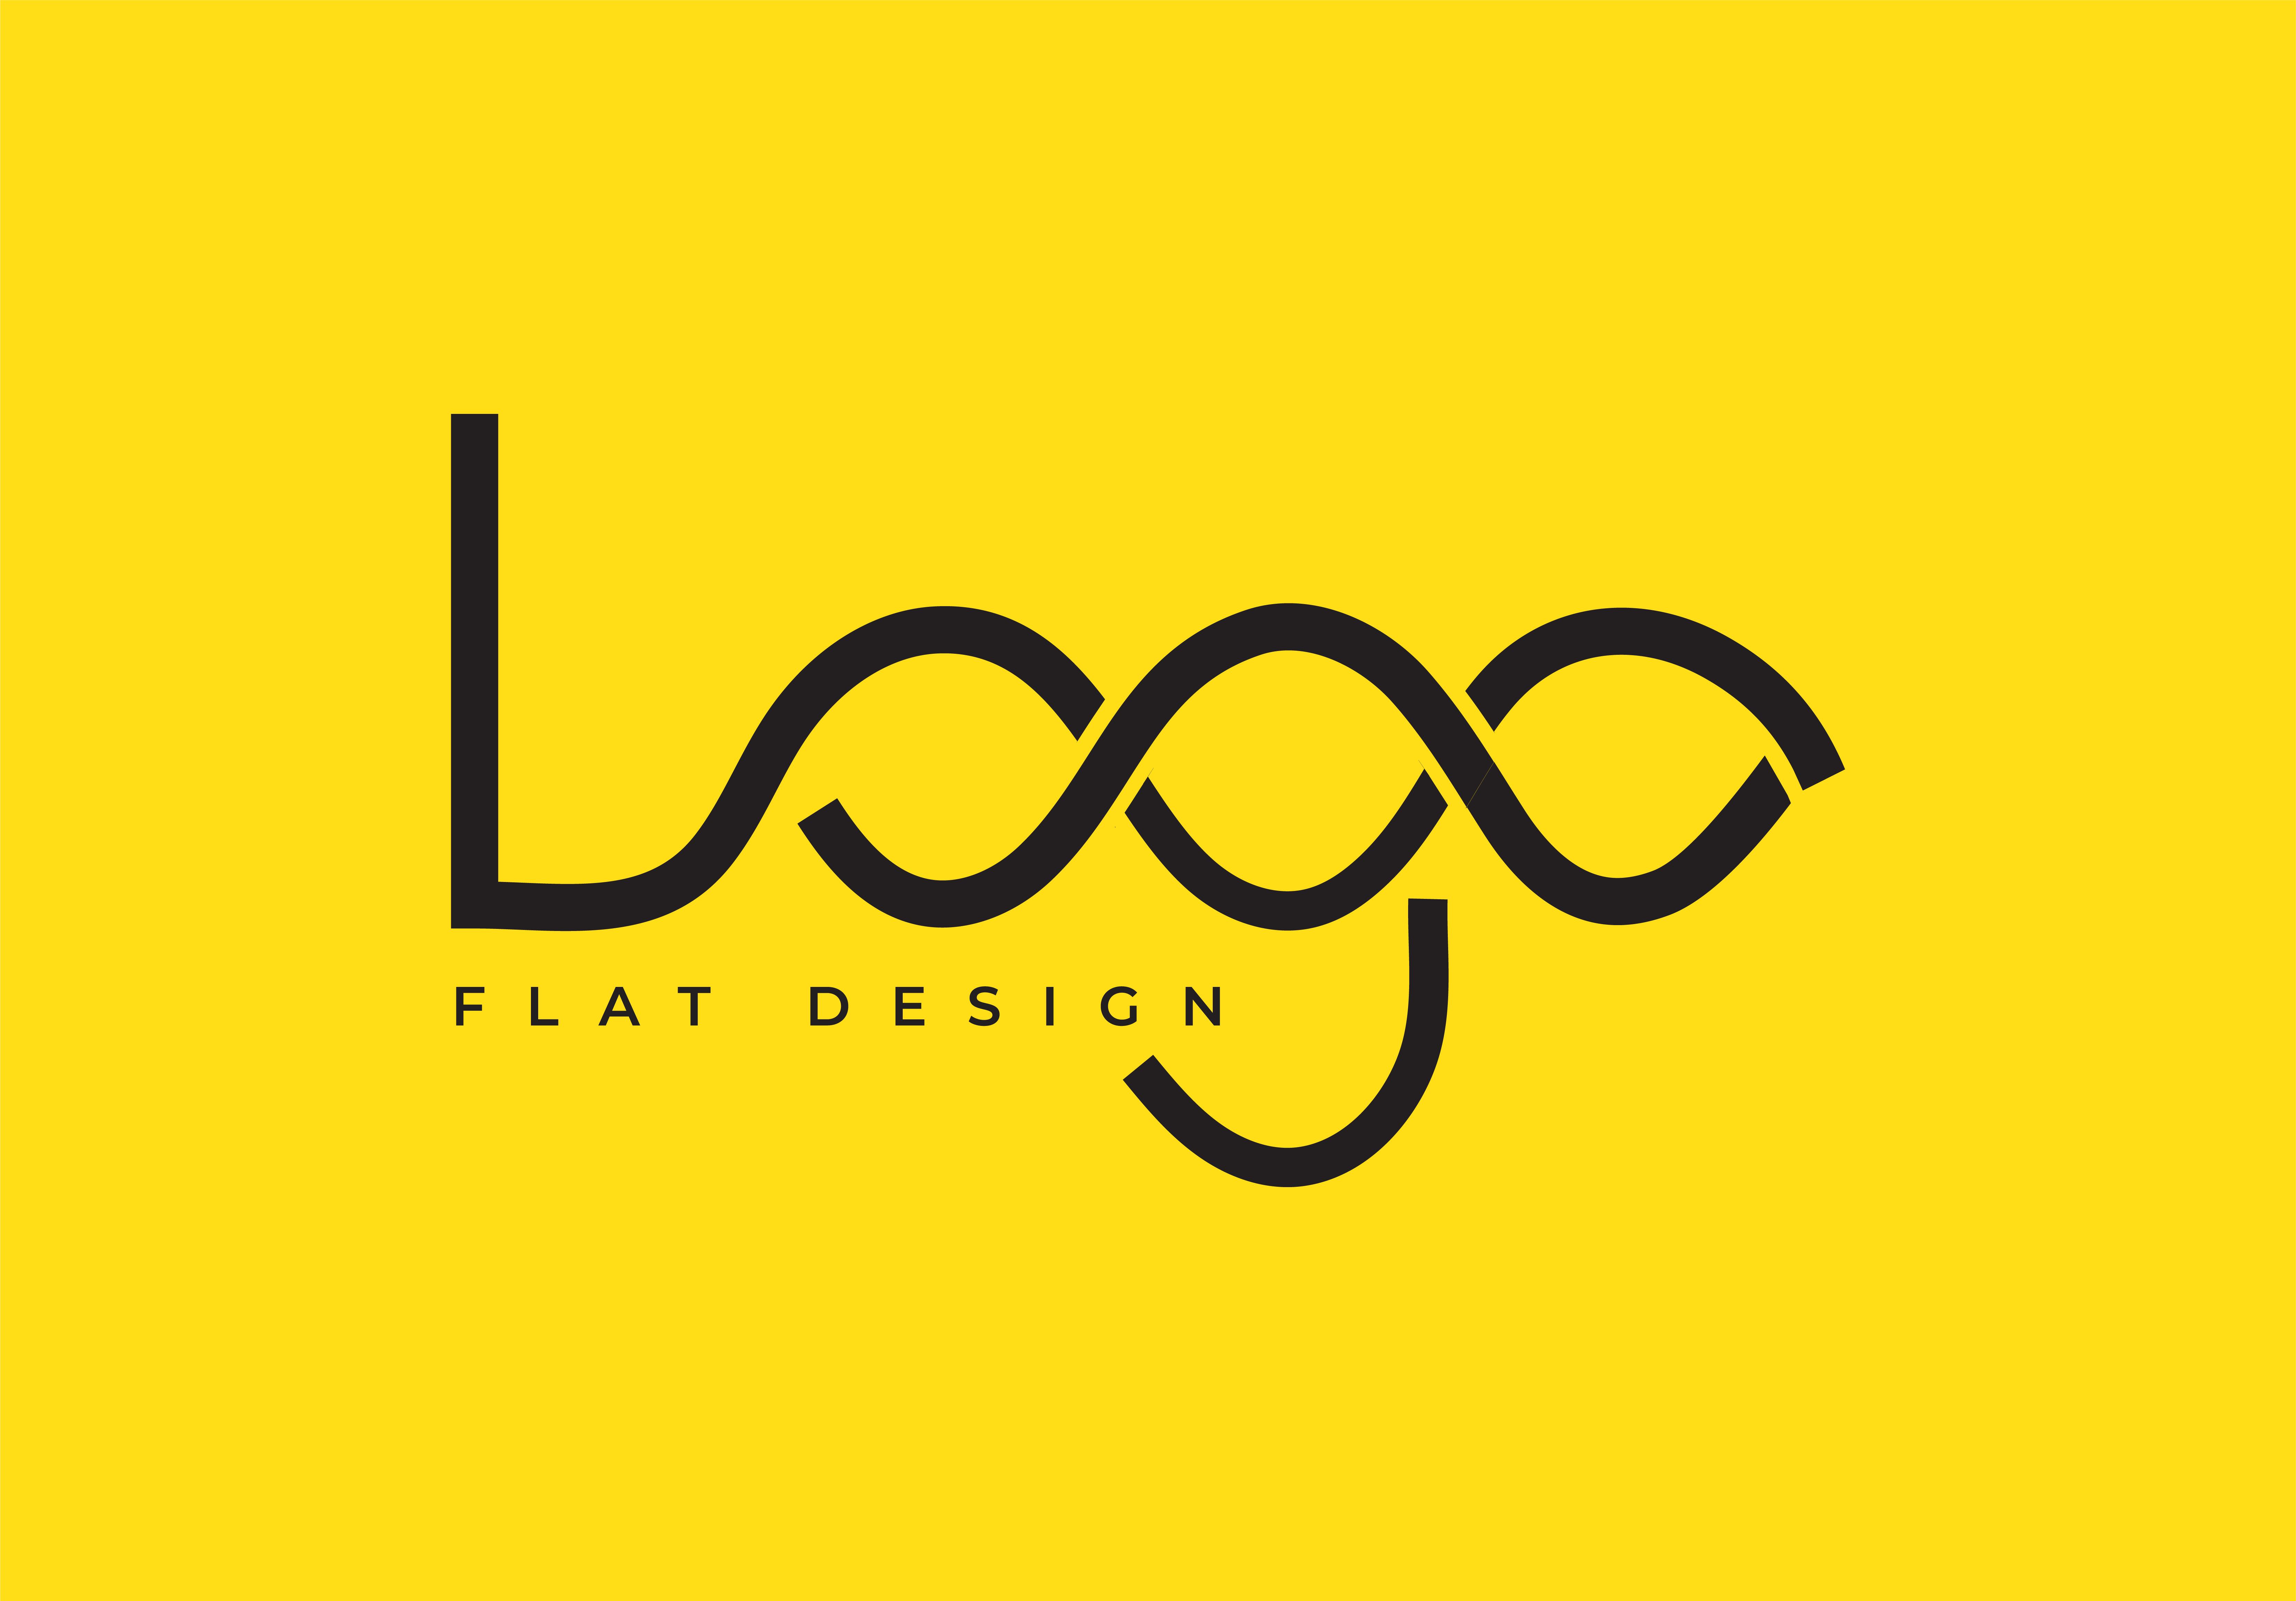 I will do clean and modern minimalist logo design